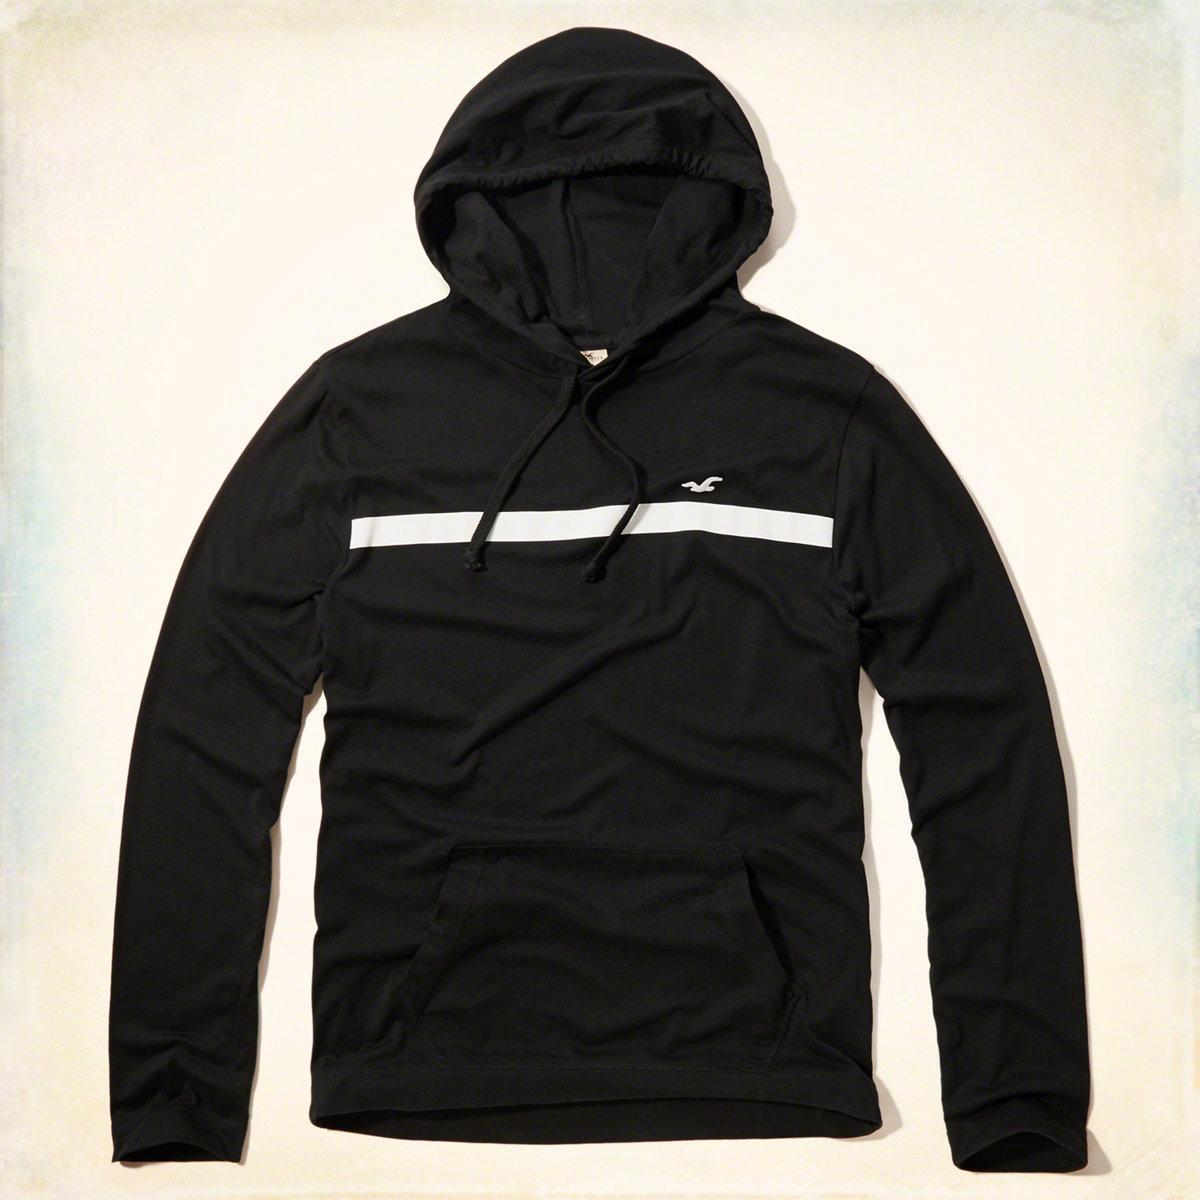 Hollister hoodie voor €13,50 na code @ Hollister